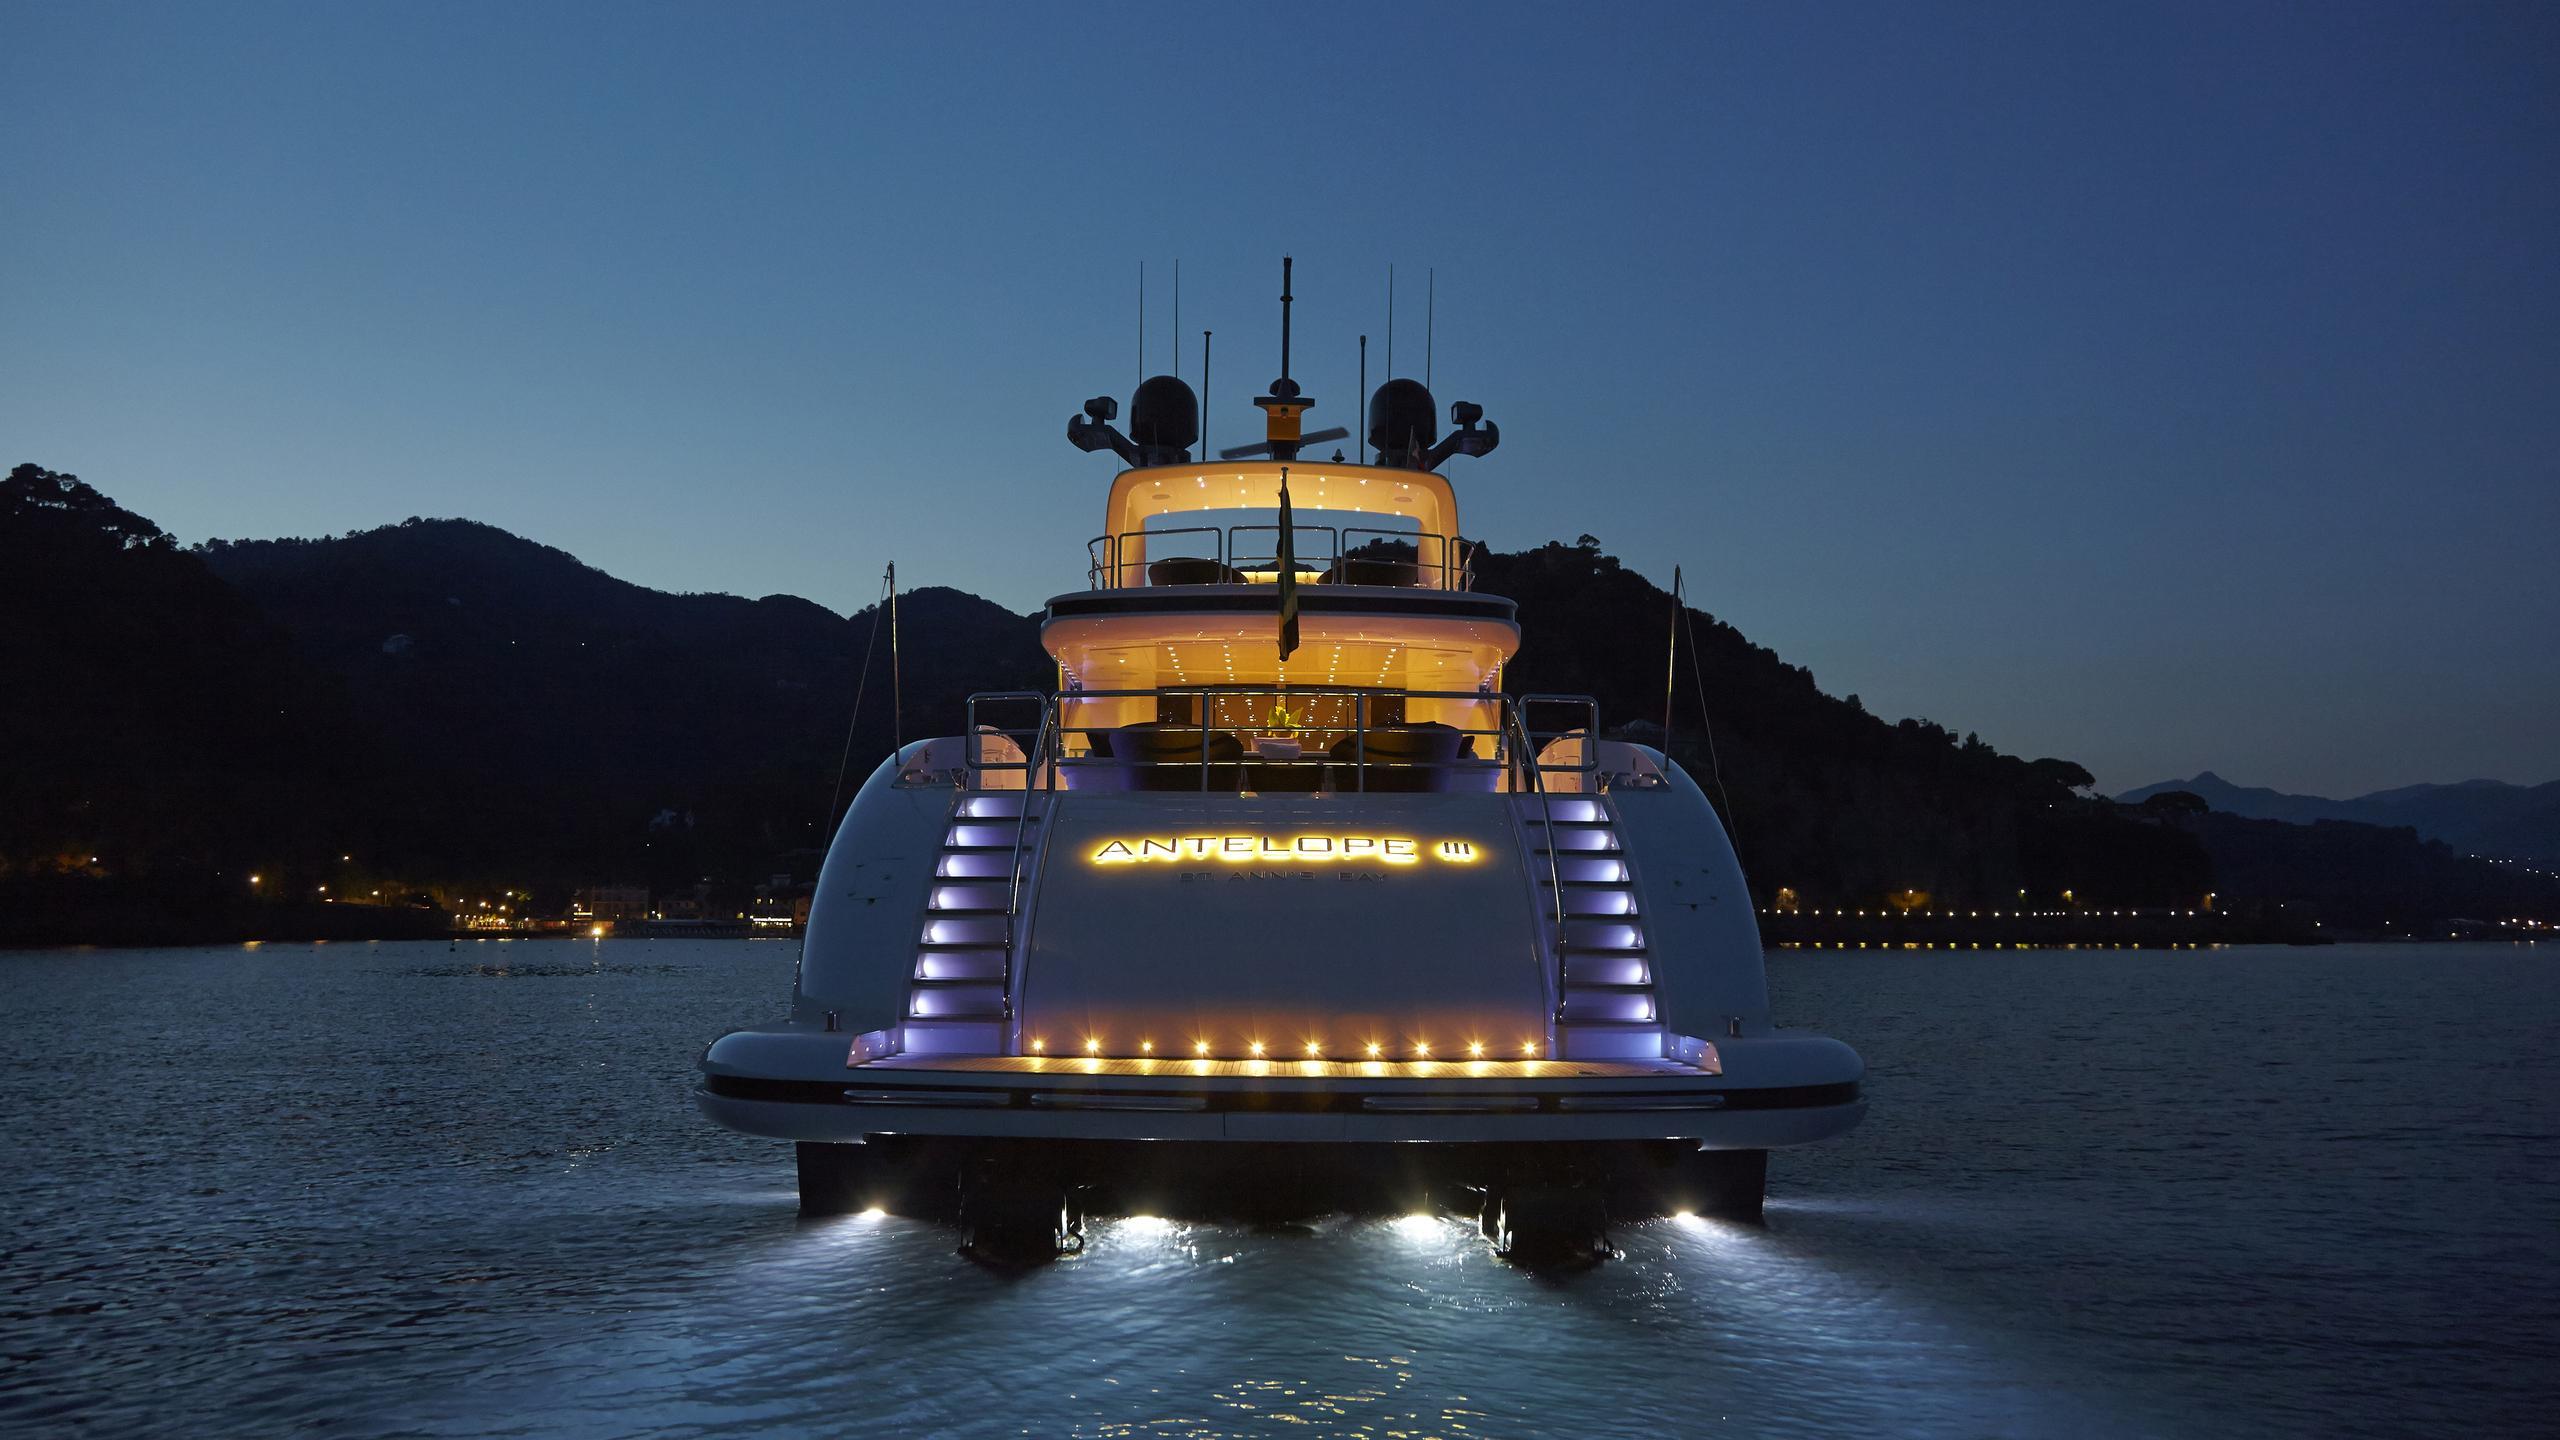 antelope-III-yacht-stern